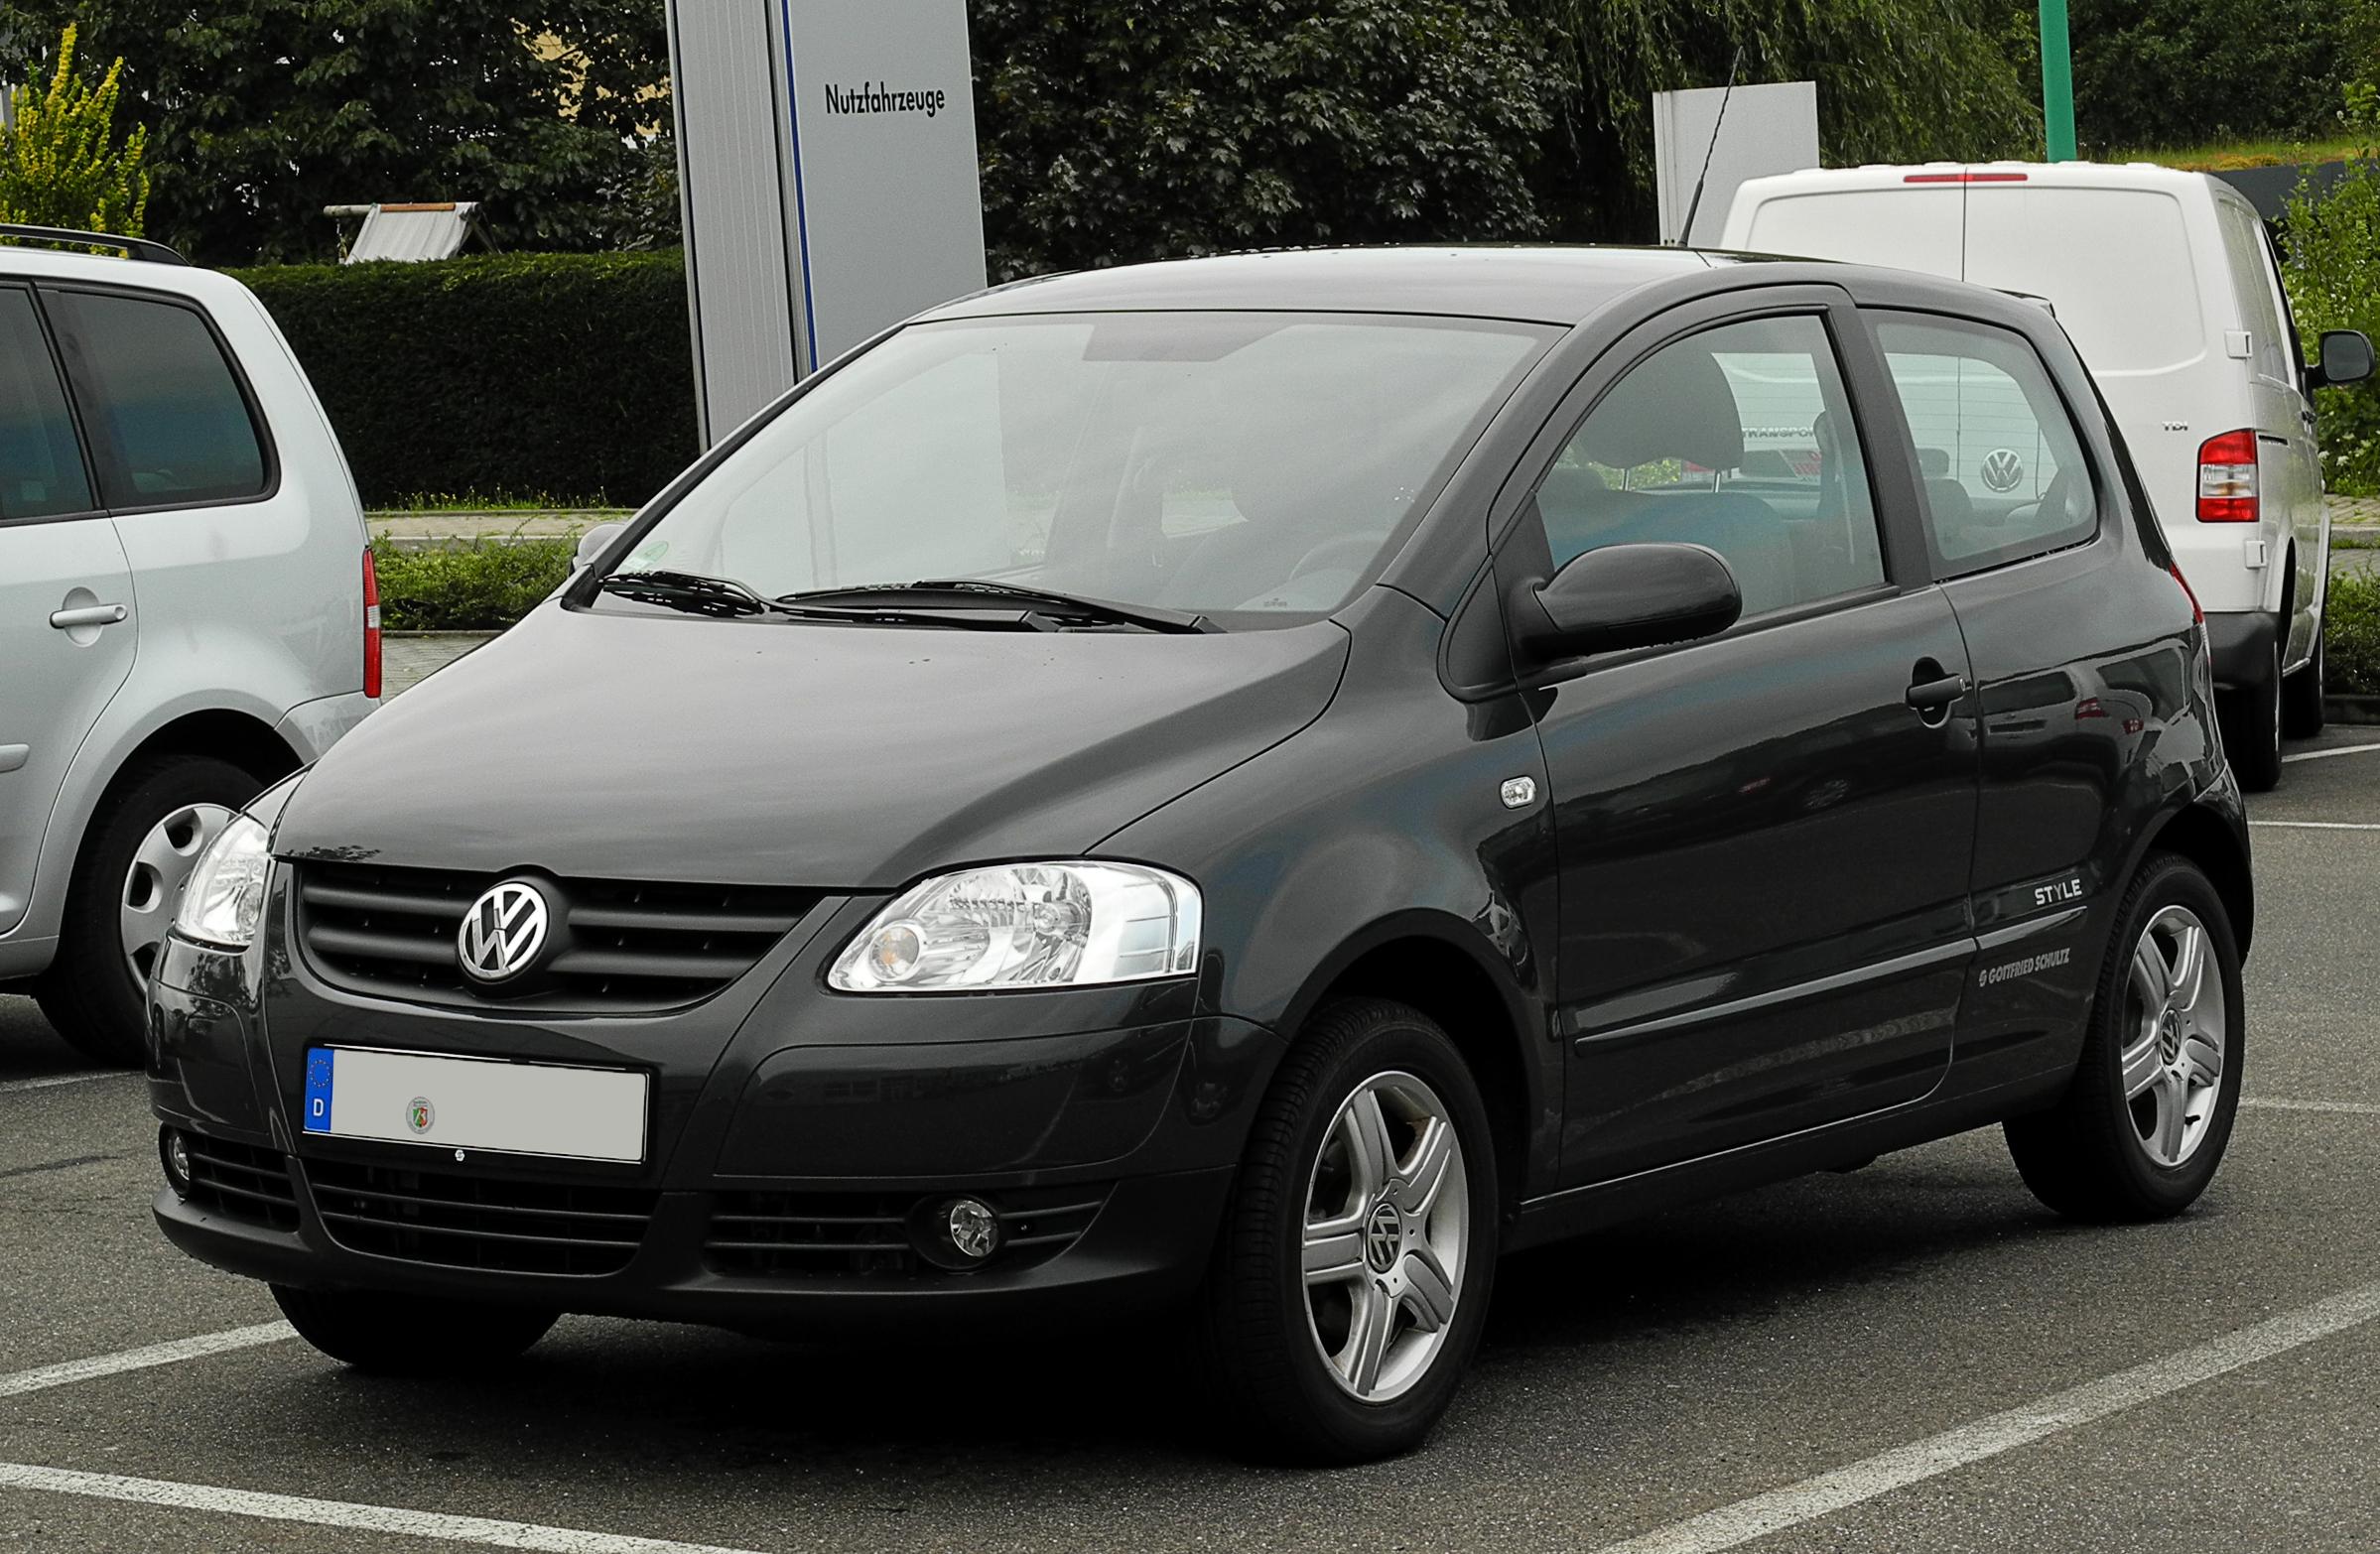 File:VW Fox 1.2 Style – Frontansicht, 14. August 2011, Velbert.jpg - Wikimedia Commons